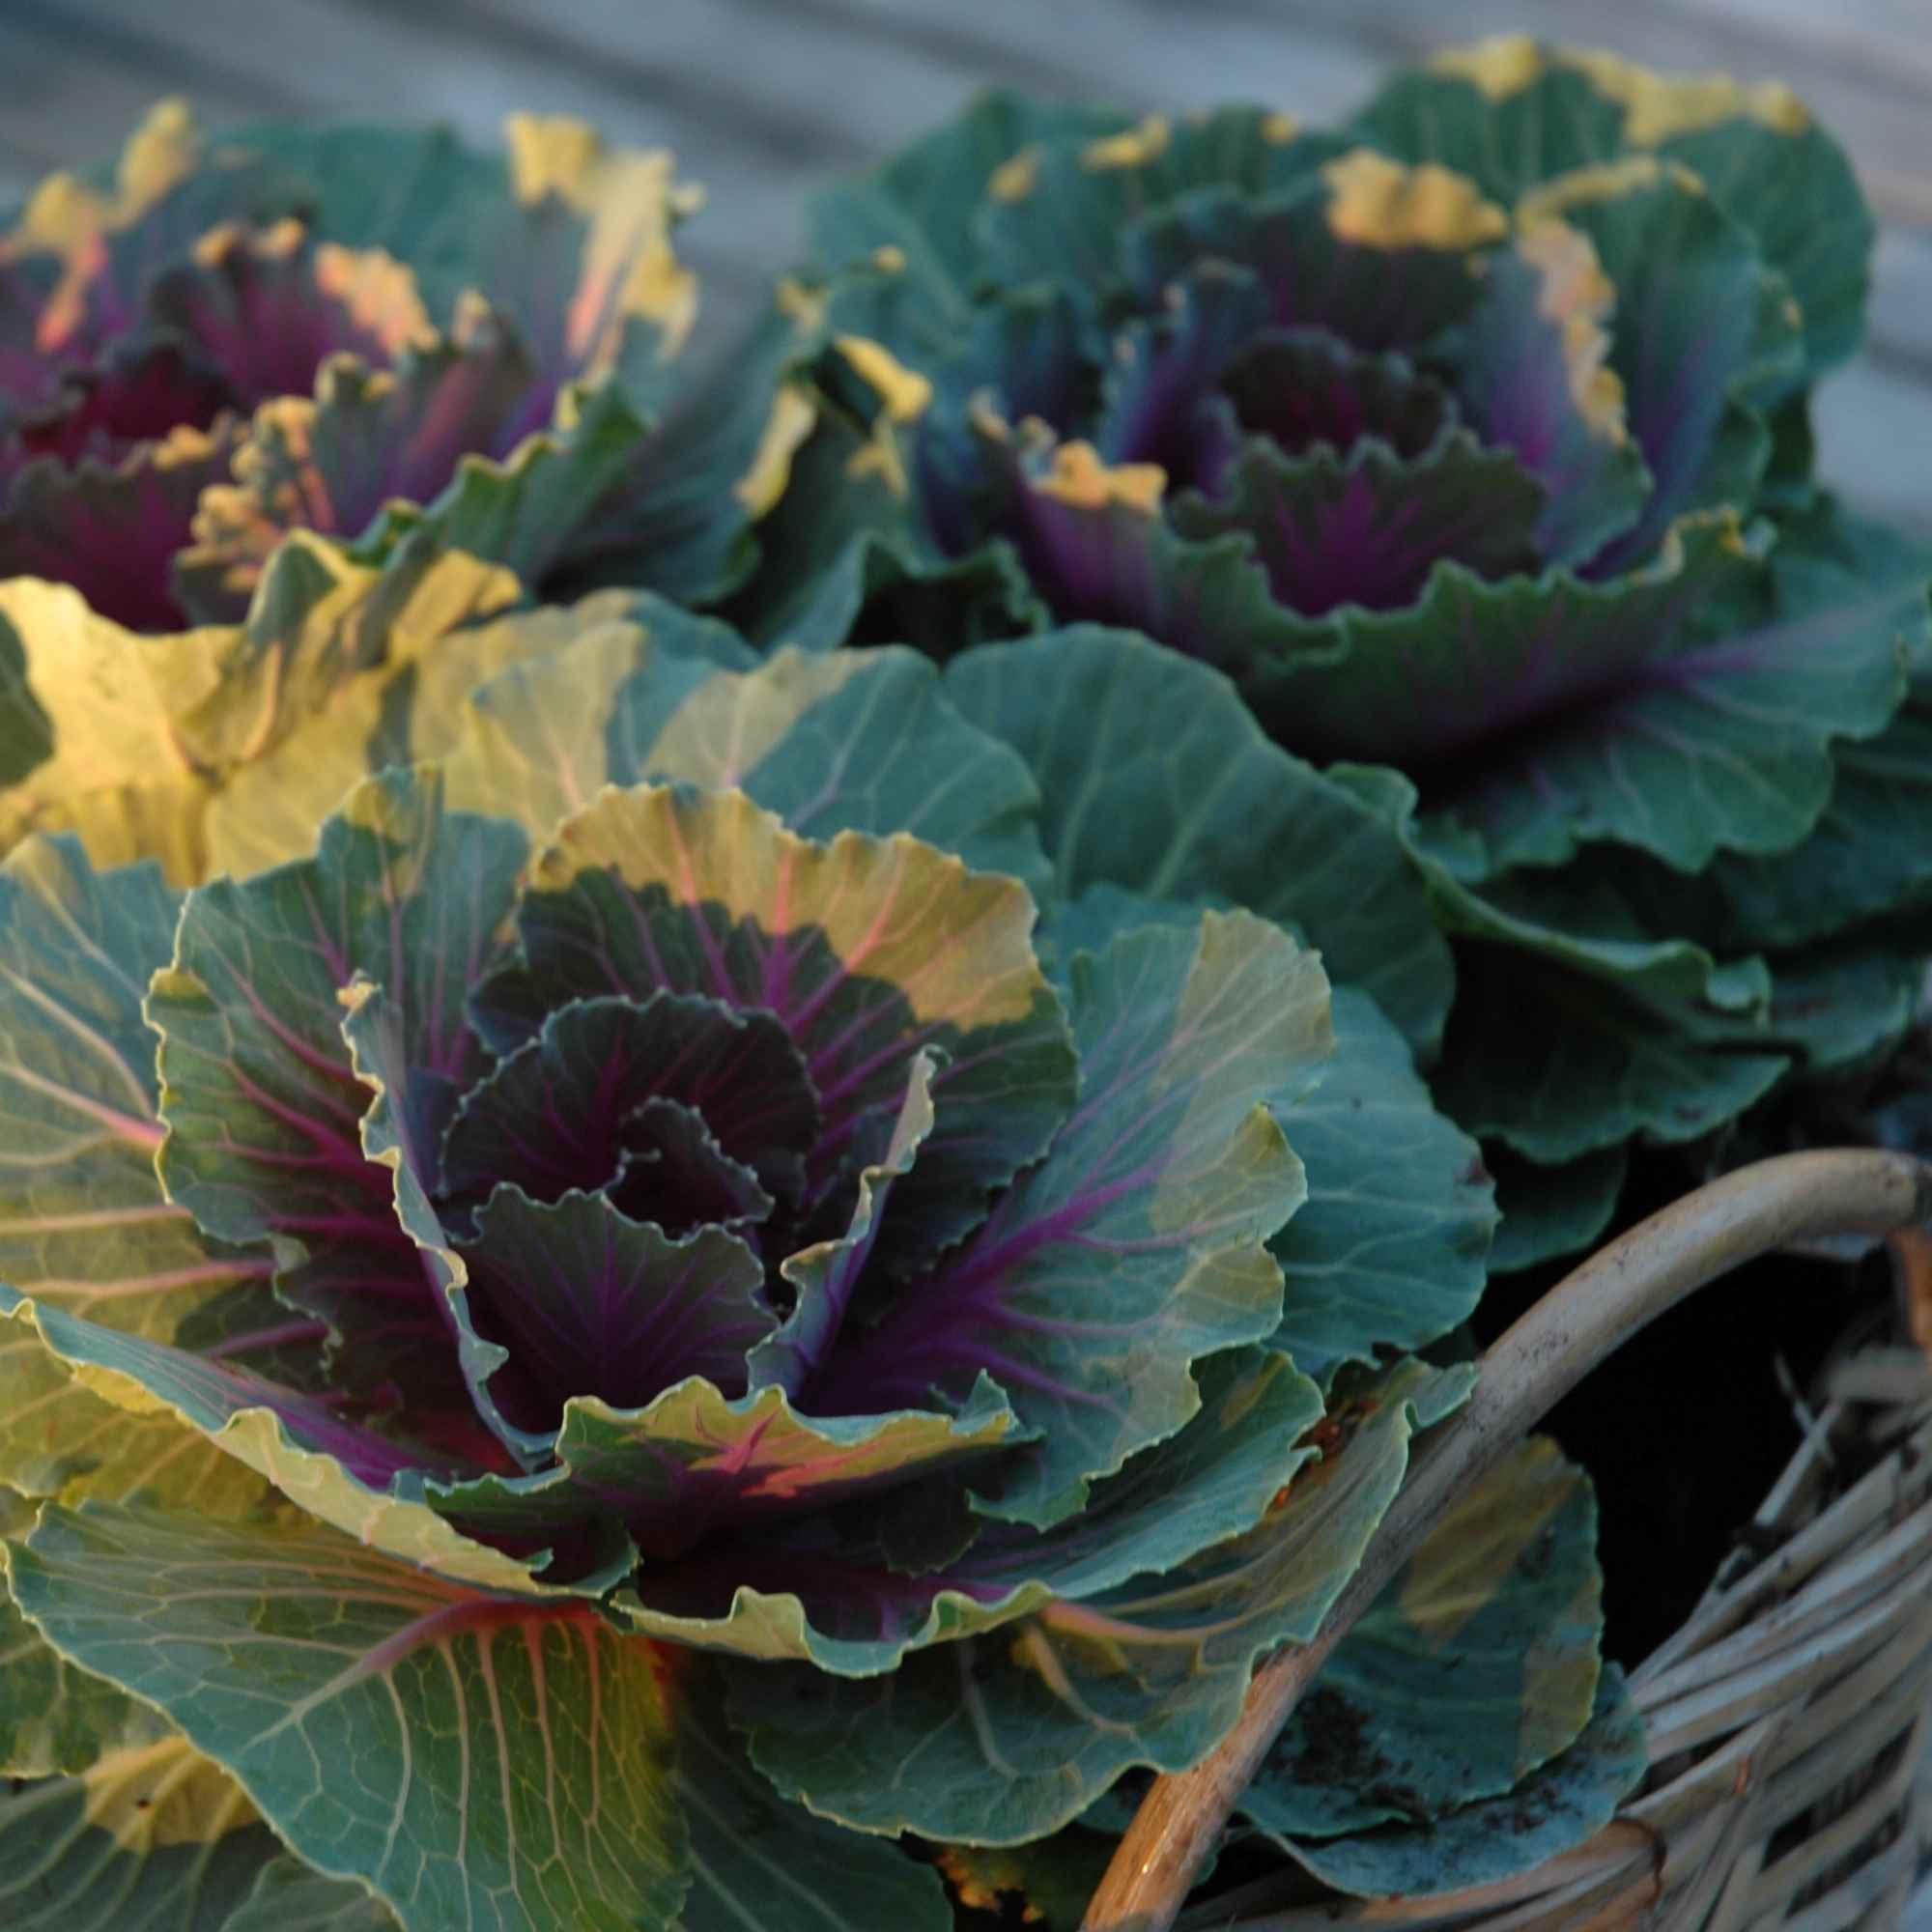 Container garden basket with three flowering cabbage